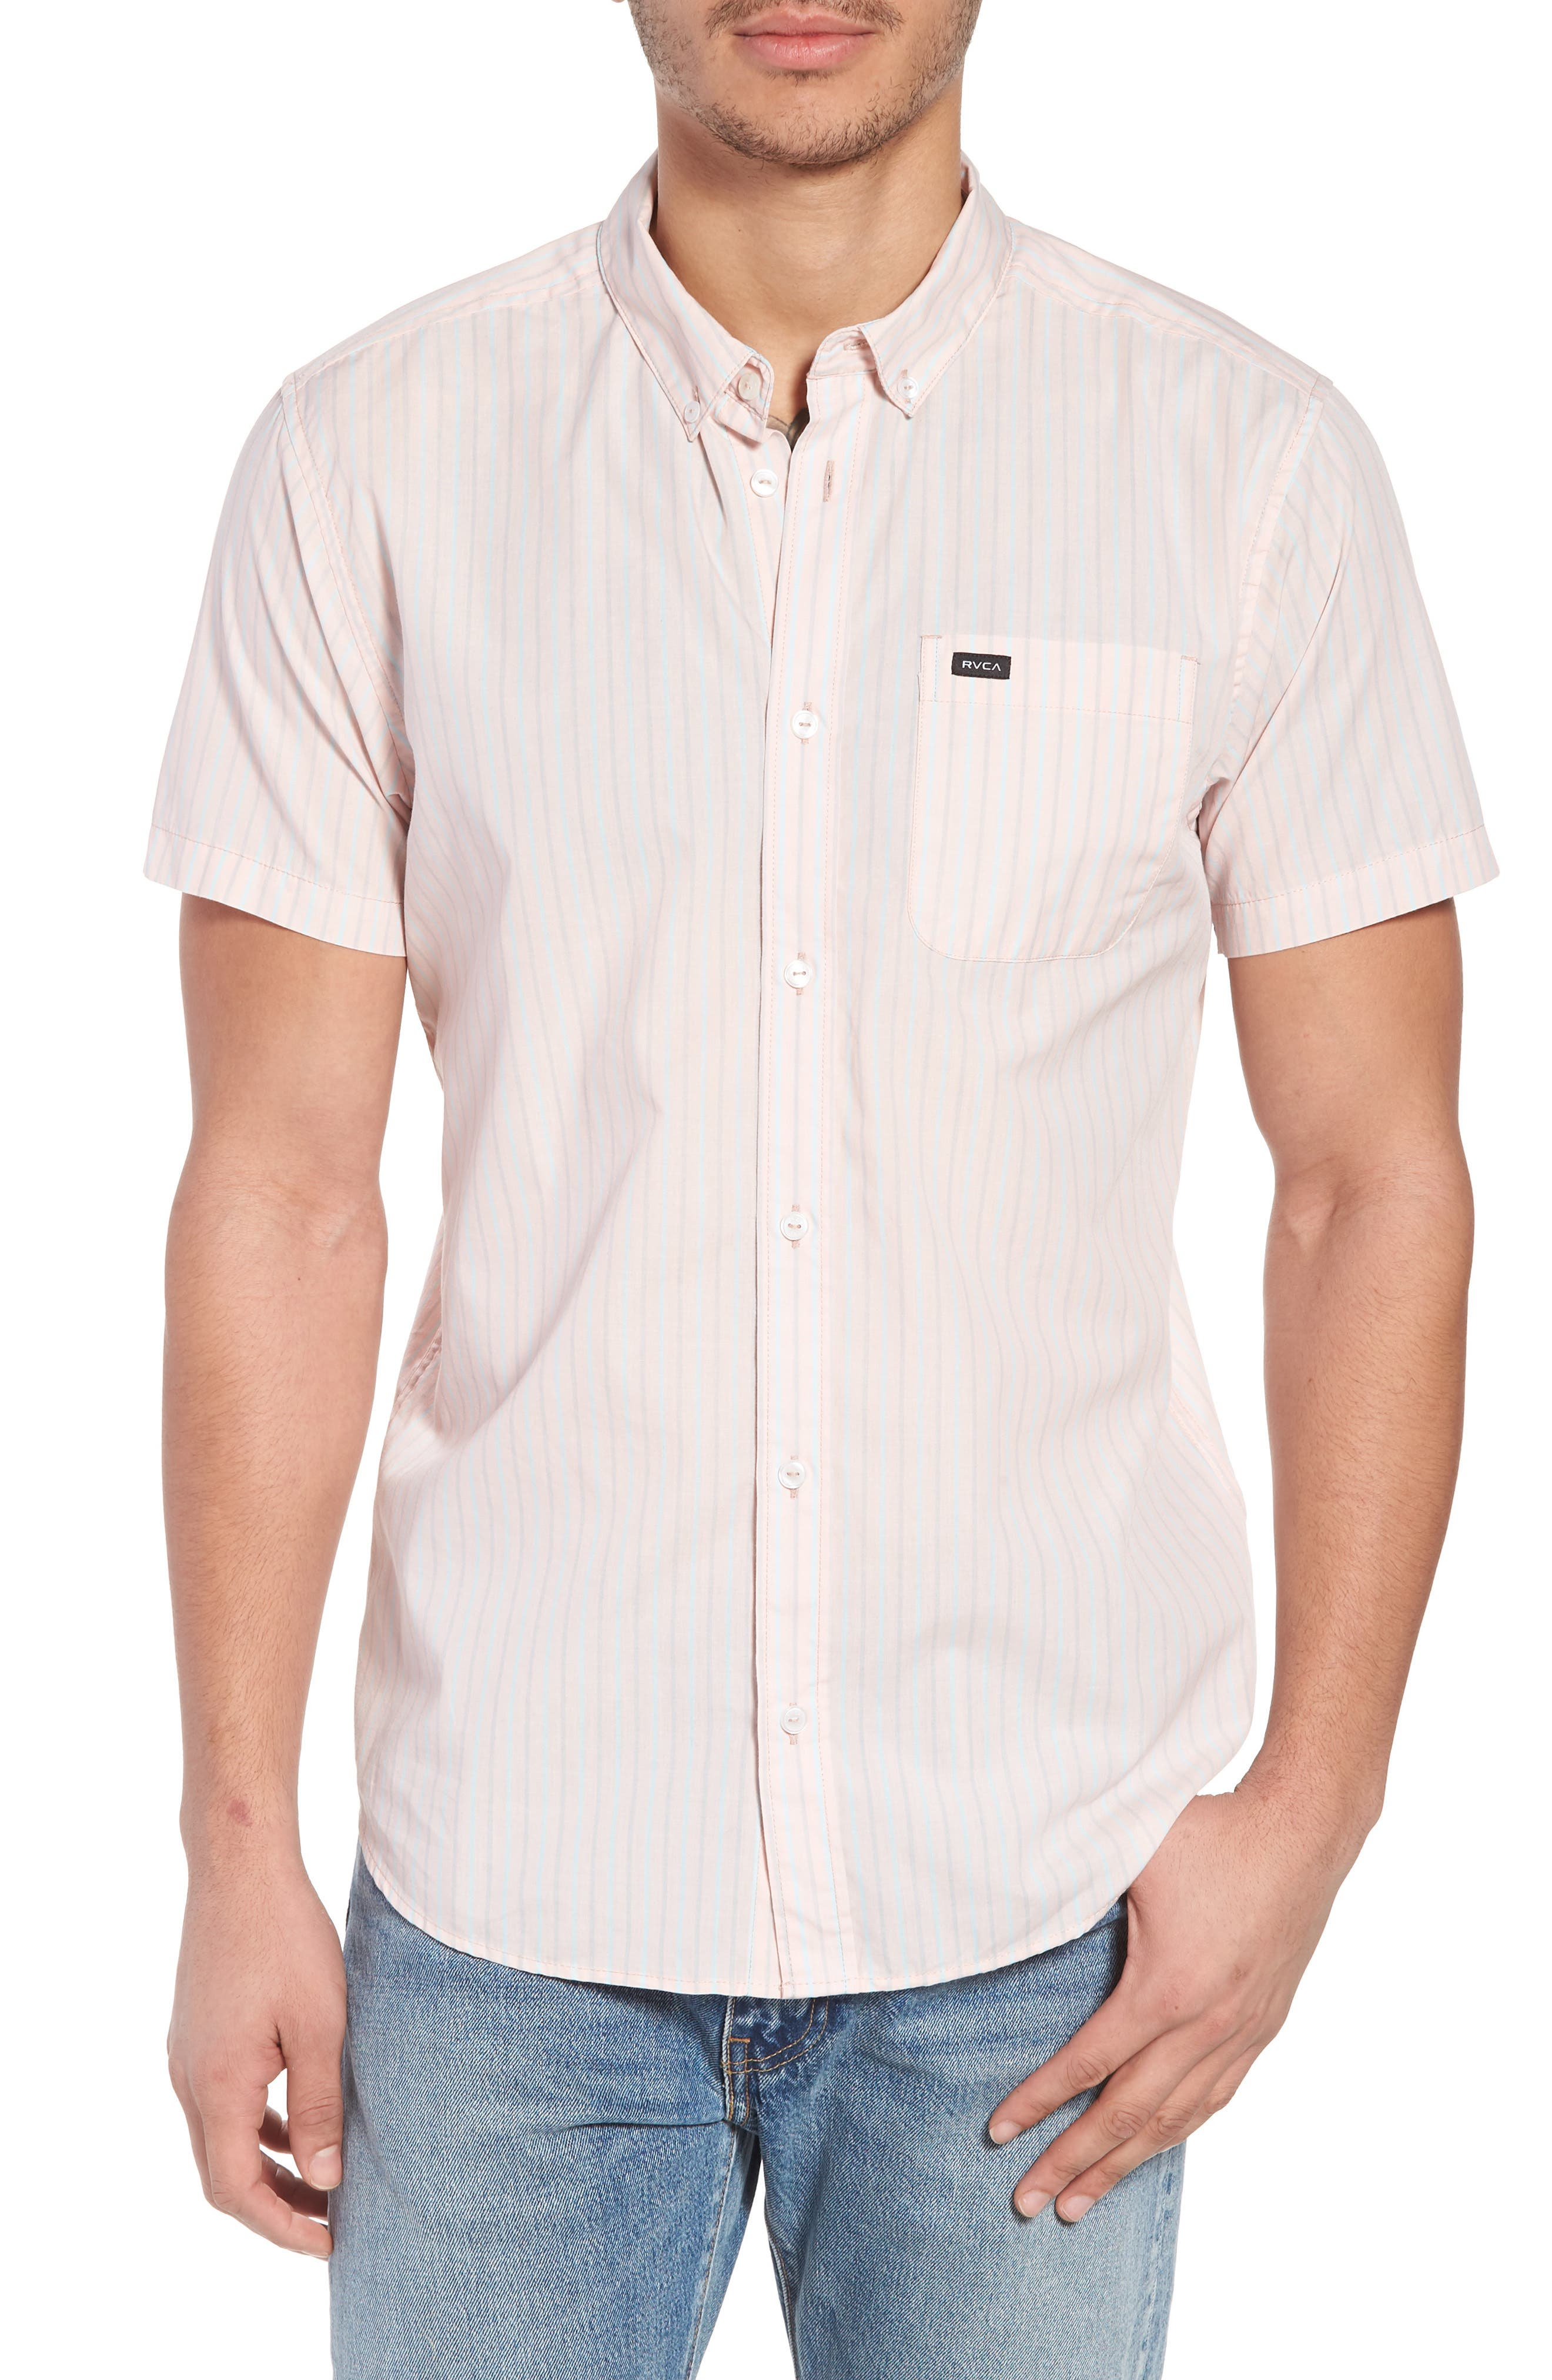 Main Image - RVCA Everyday Stripe Shirt